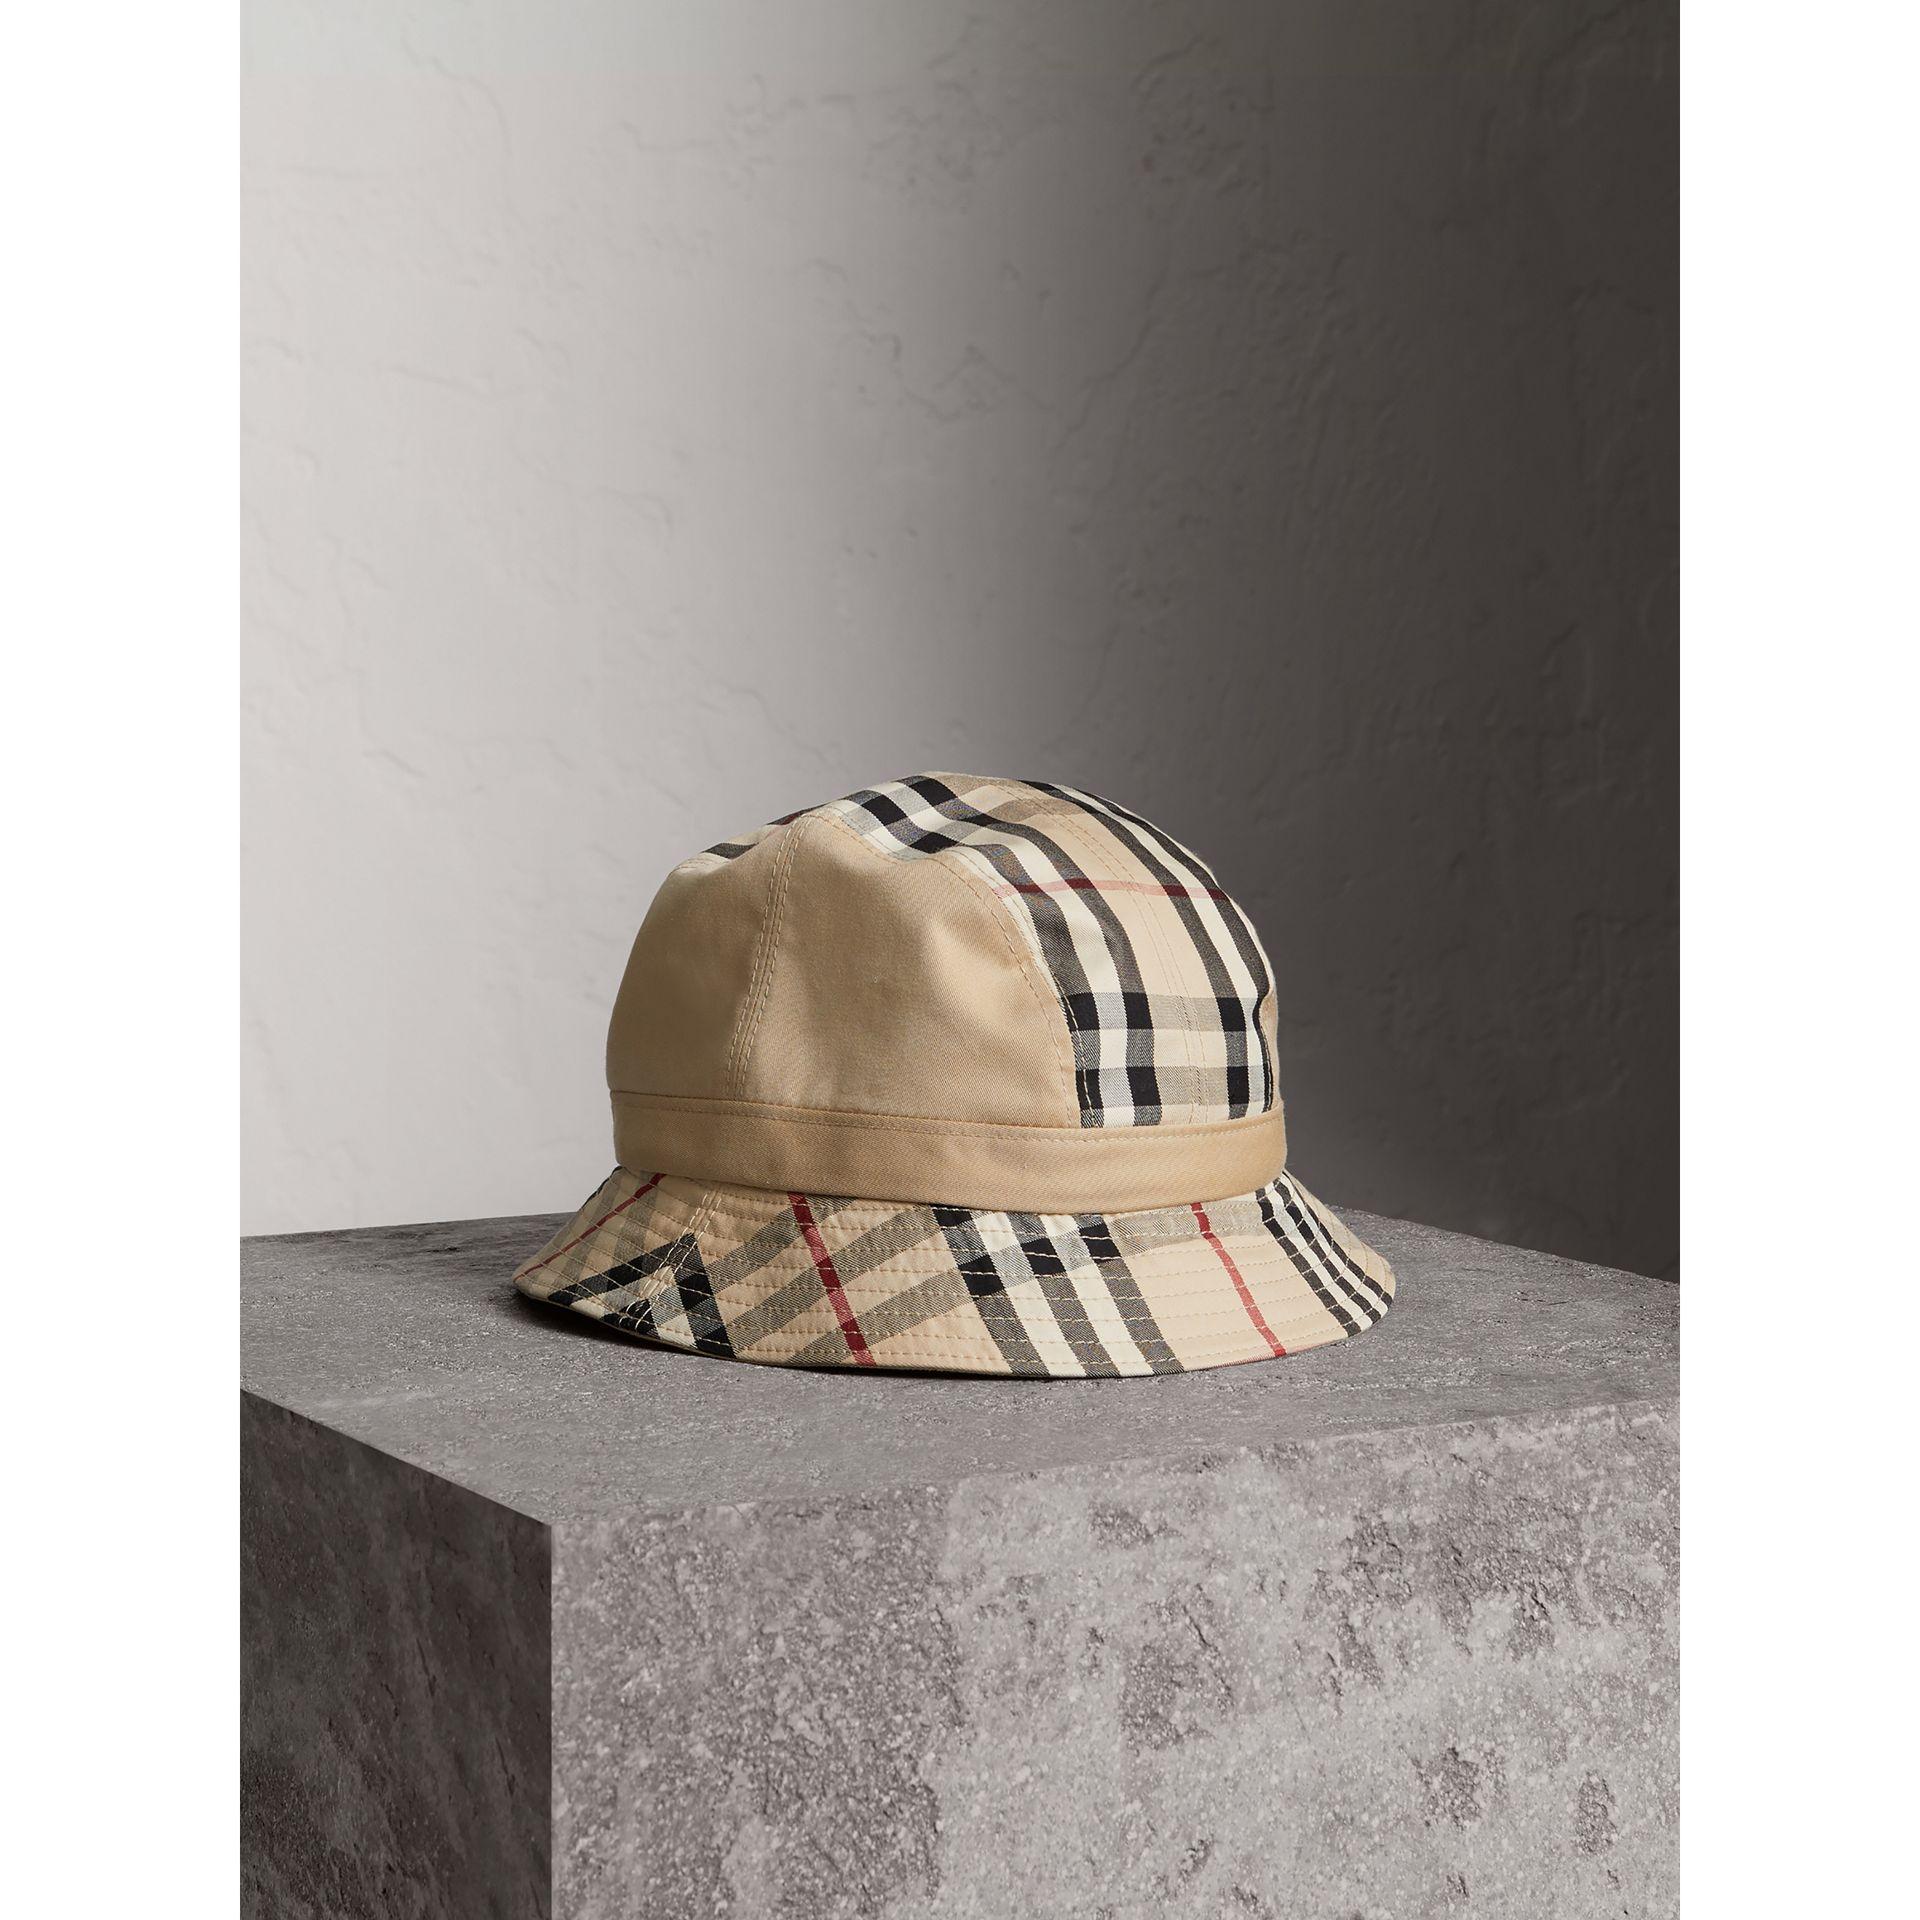 bbed2e3bc Gosha x Burberry Bucket Hat